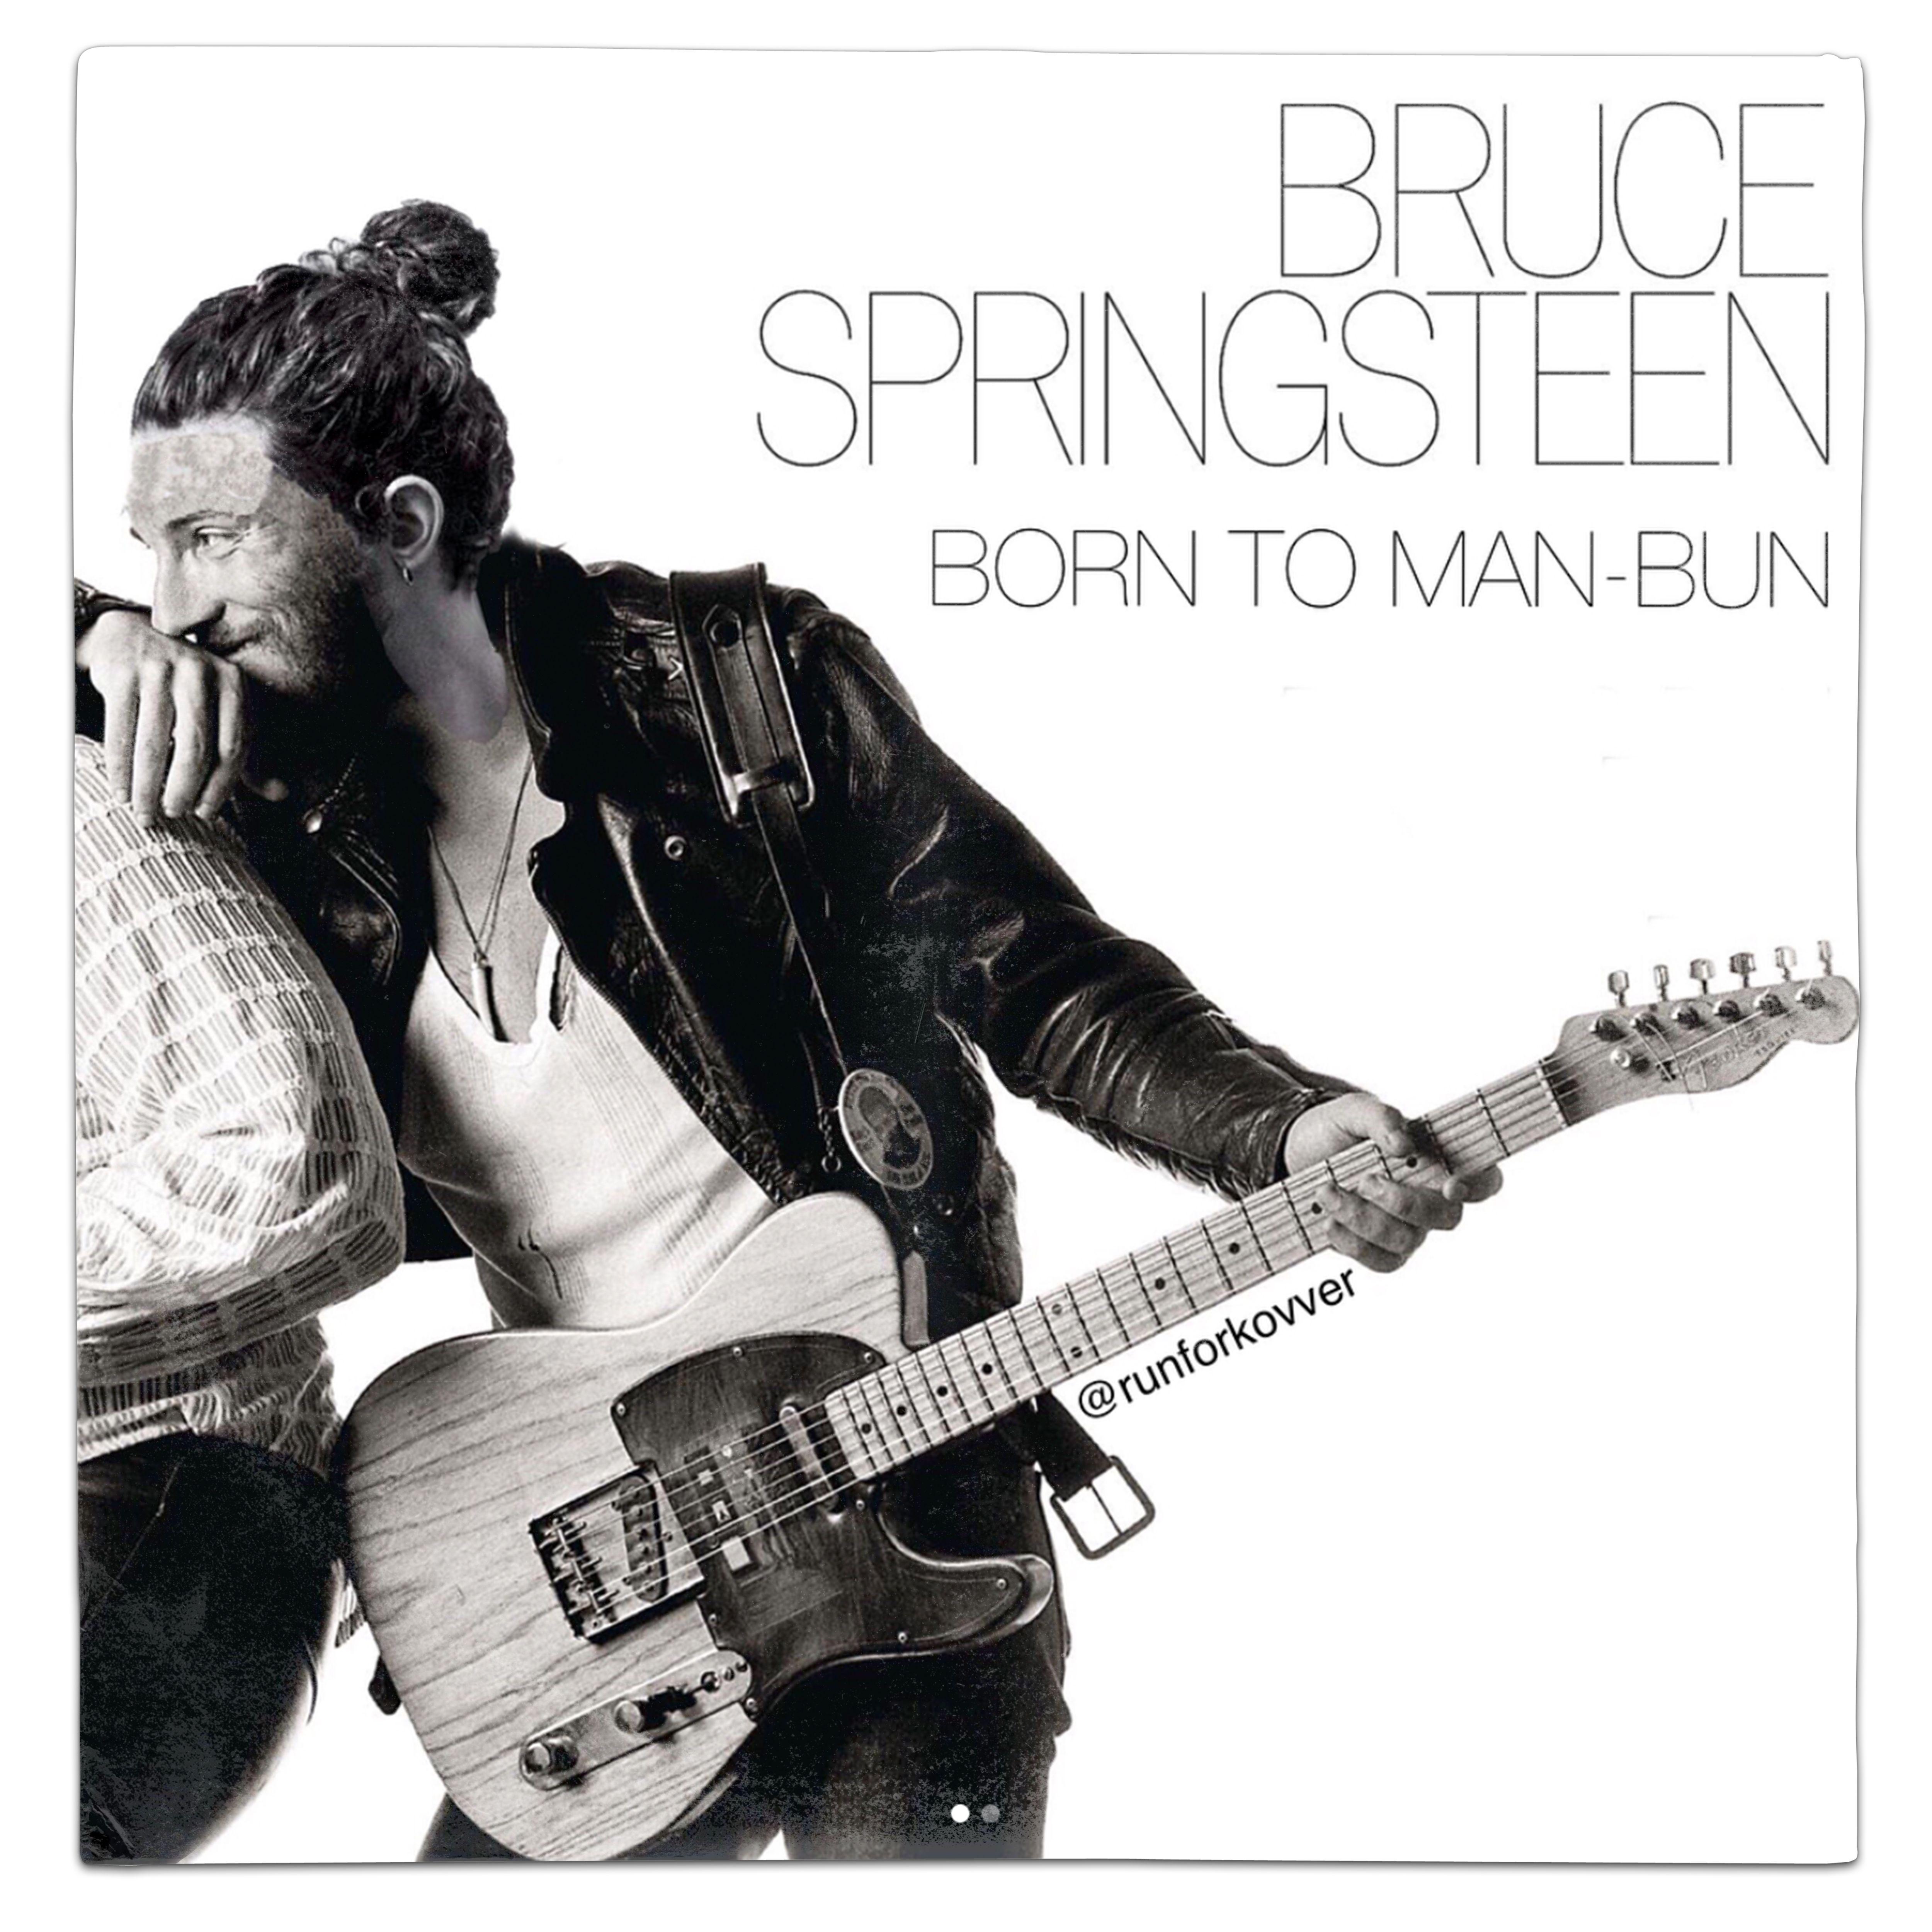 Bruce Springsteen Born To Run Man Bun Vinyl Mash Up Parody By Everbest Bjorka Handbag Hitam Runforkovver Mashup